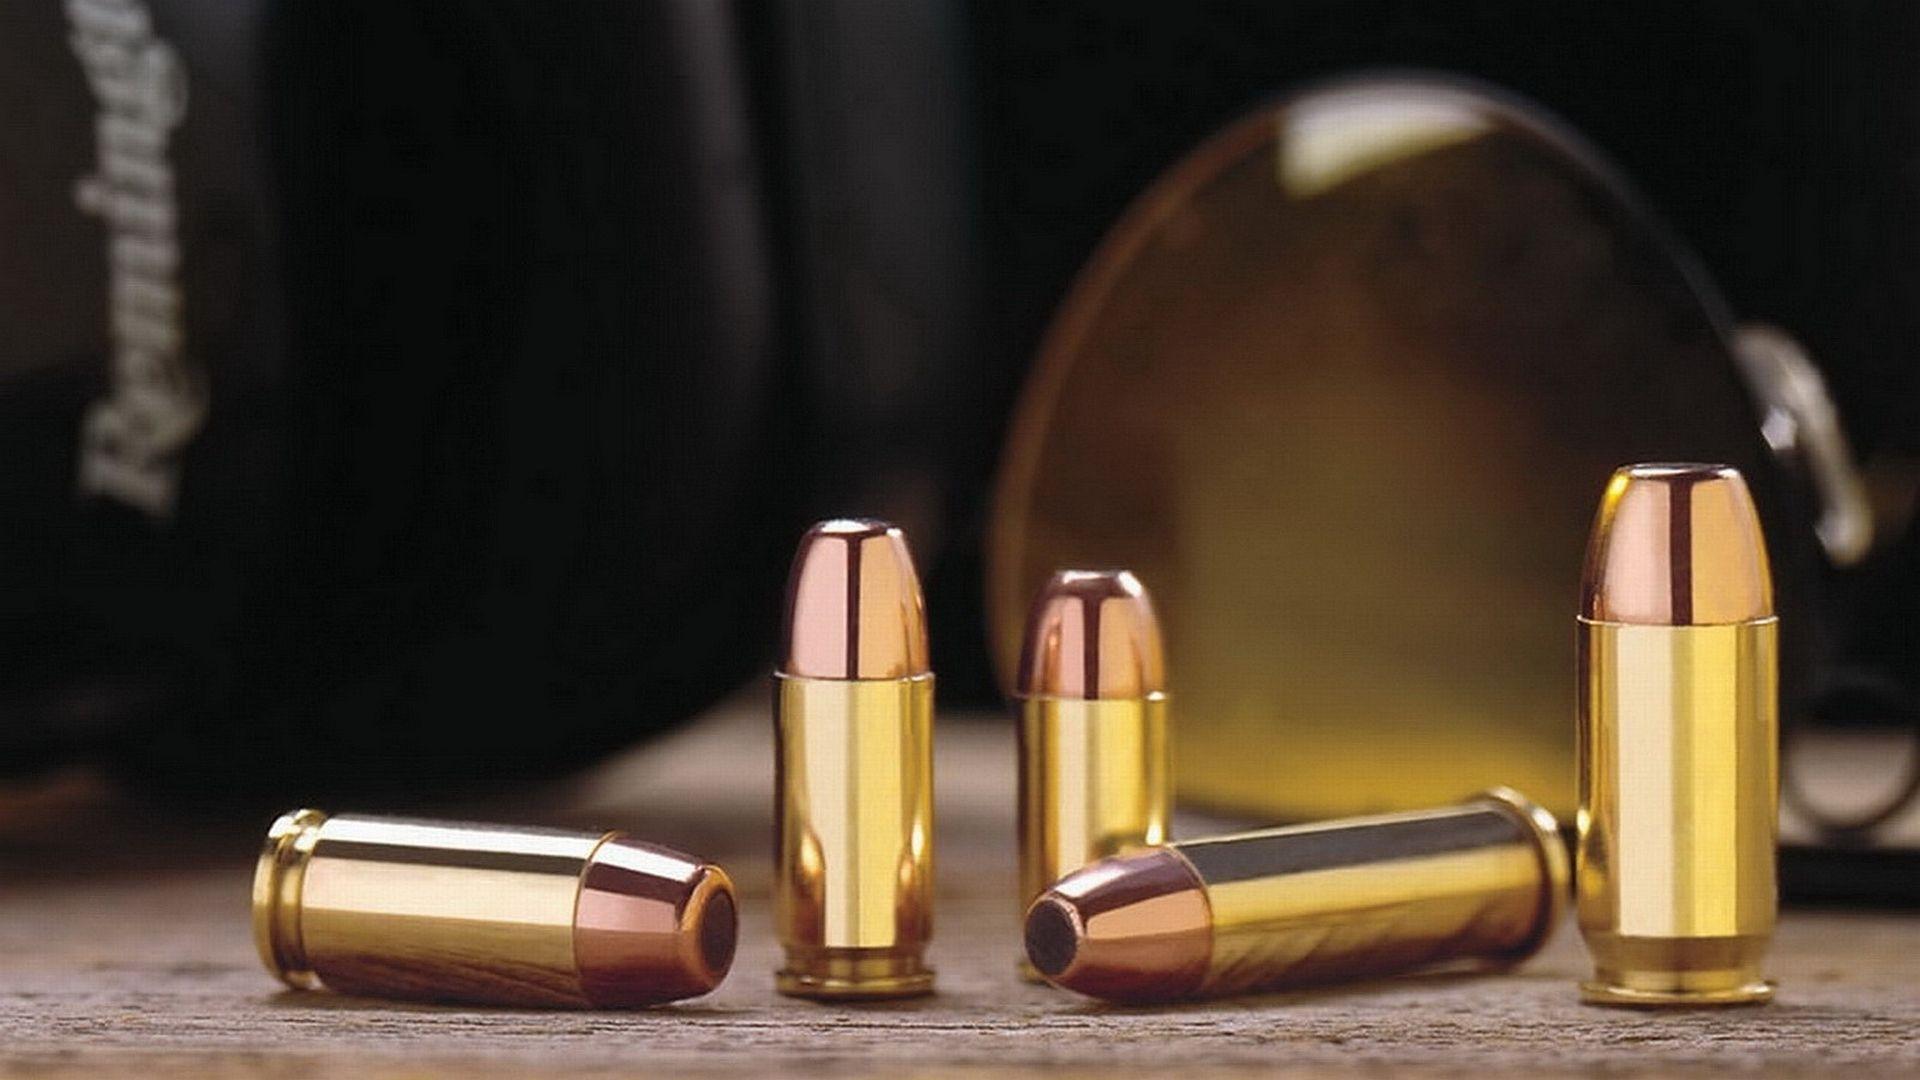 bullets hd wallpaper | hd wallpapers news | wallpaper, wallpaper